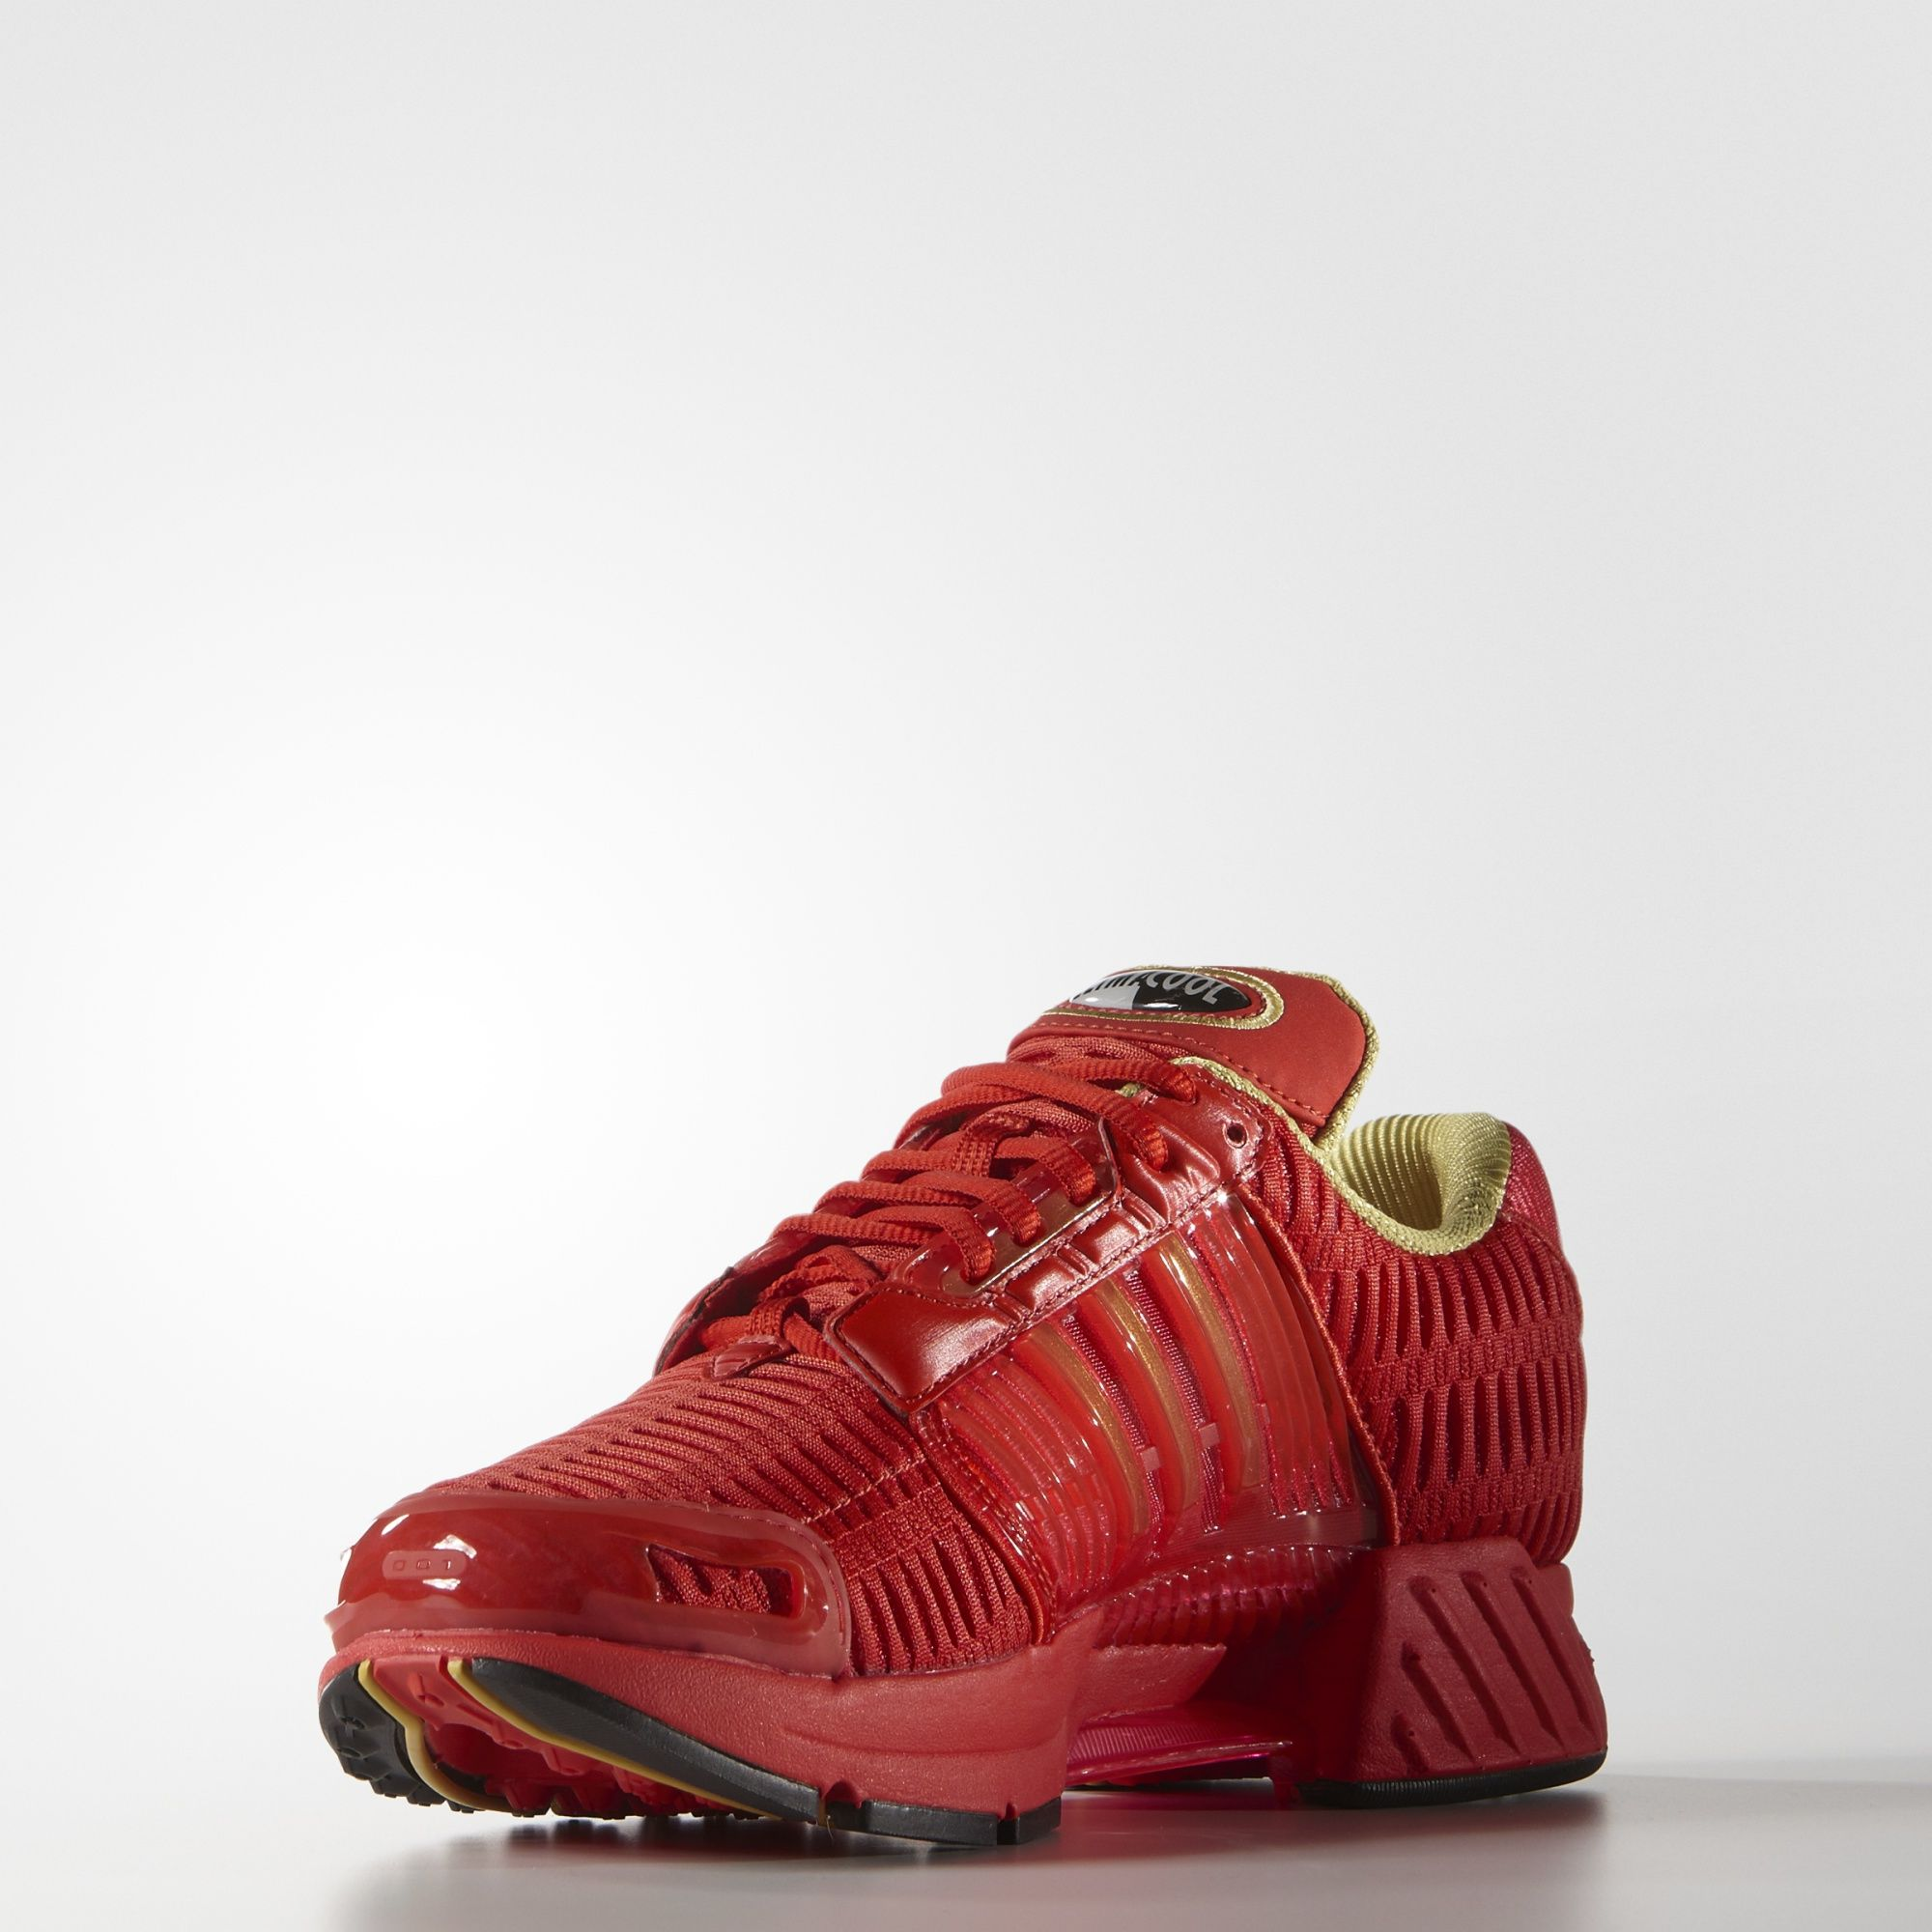 outlet store sale 52b93 e2869 Adidas ClimaCool 1 x Coca-Cola - Next Level Kickz